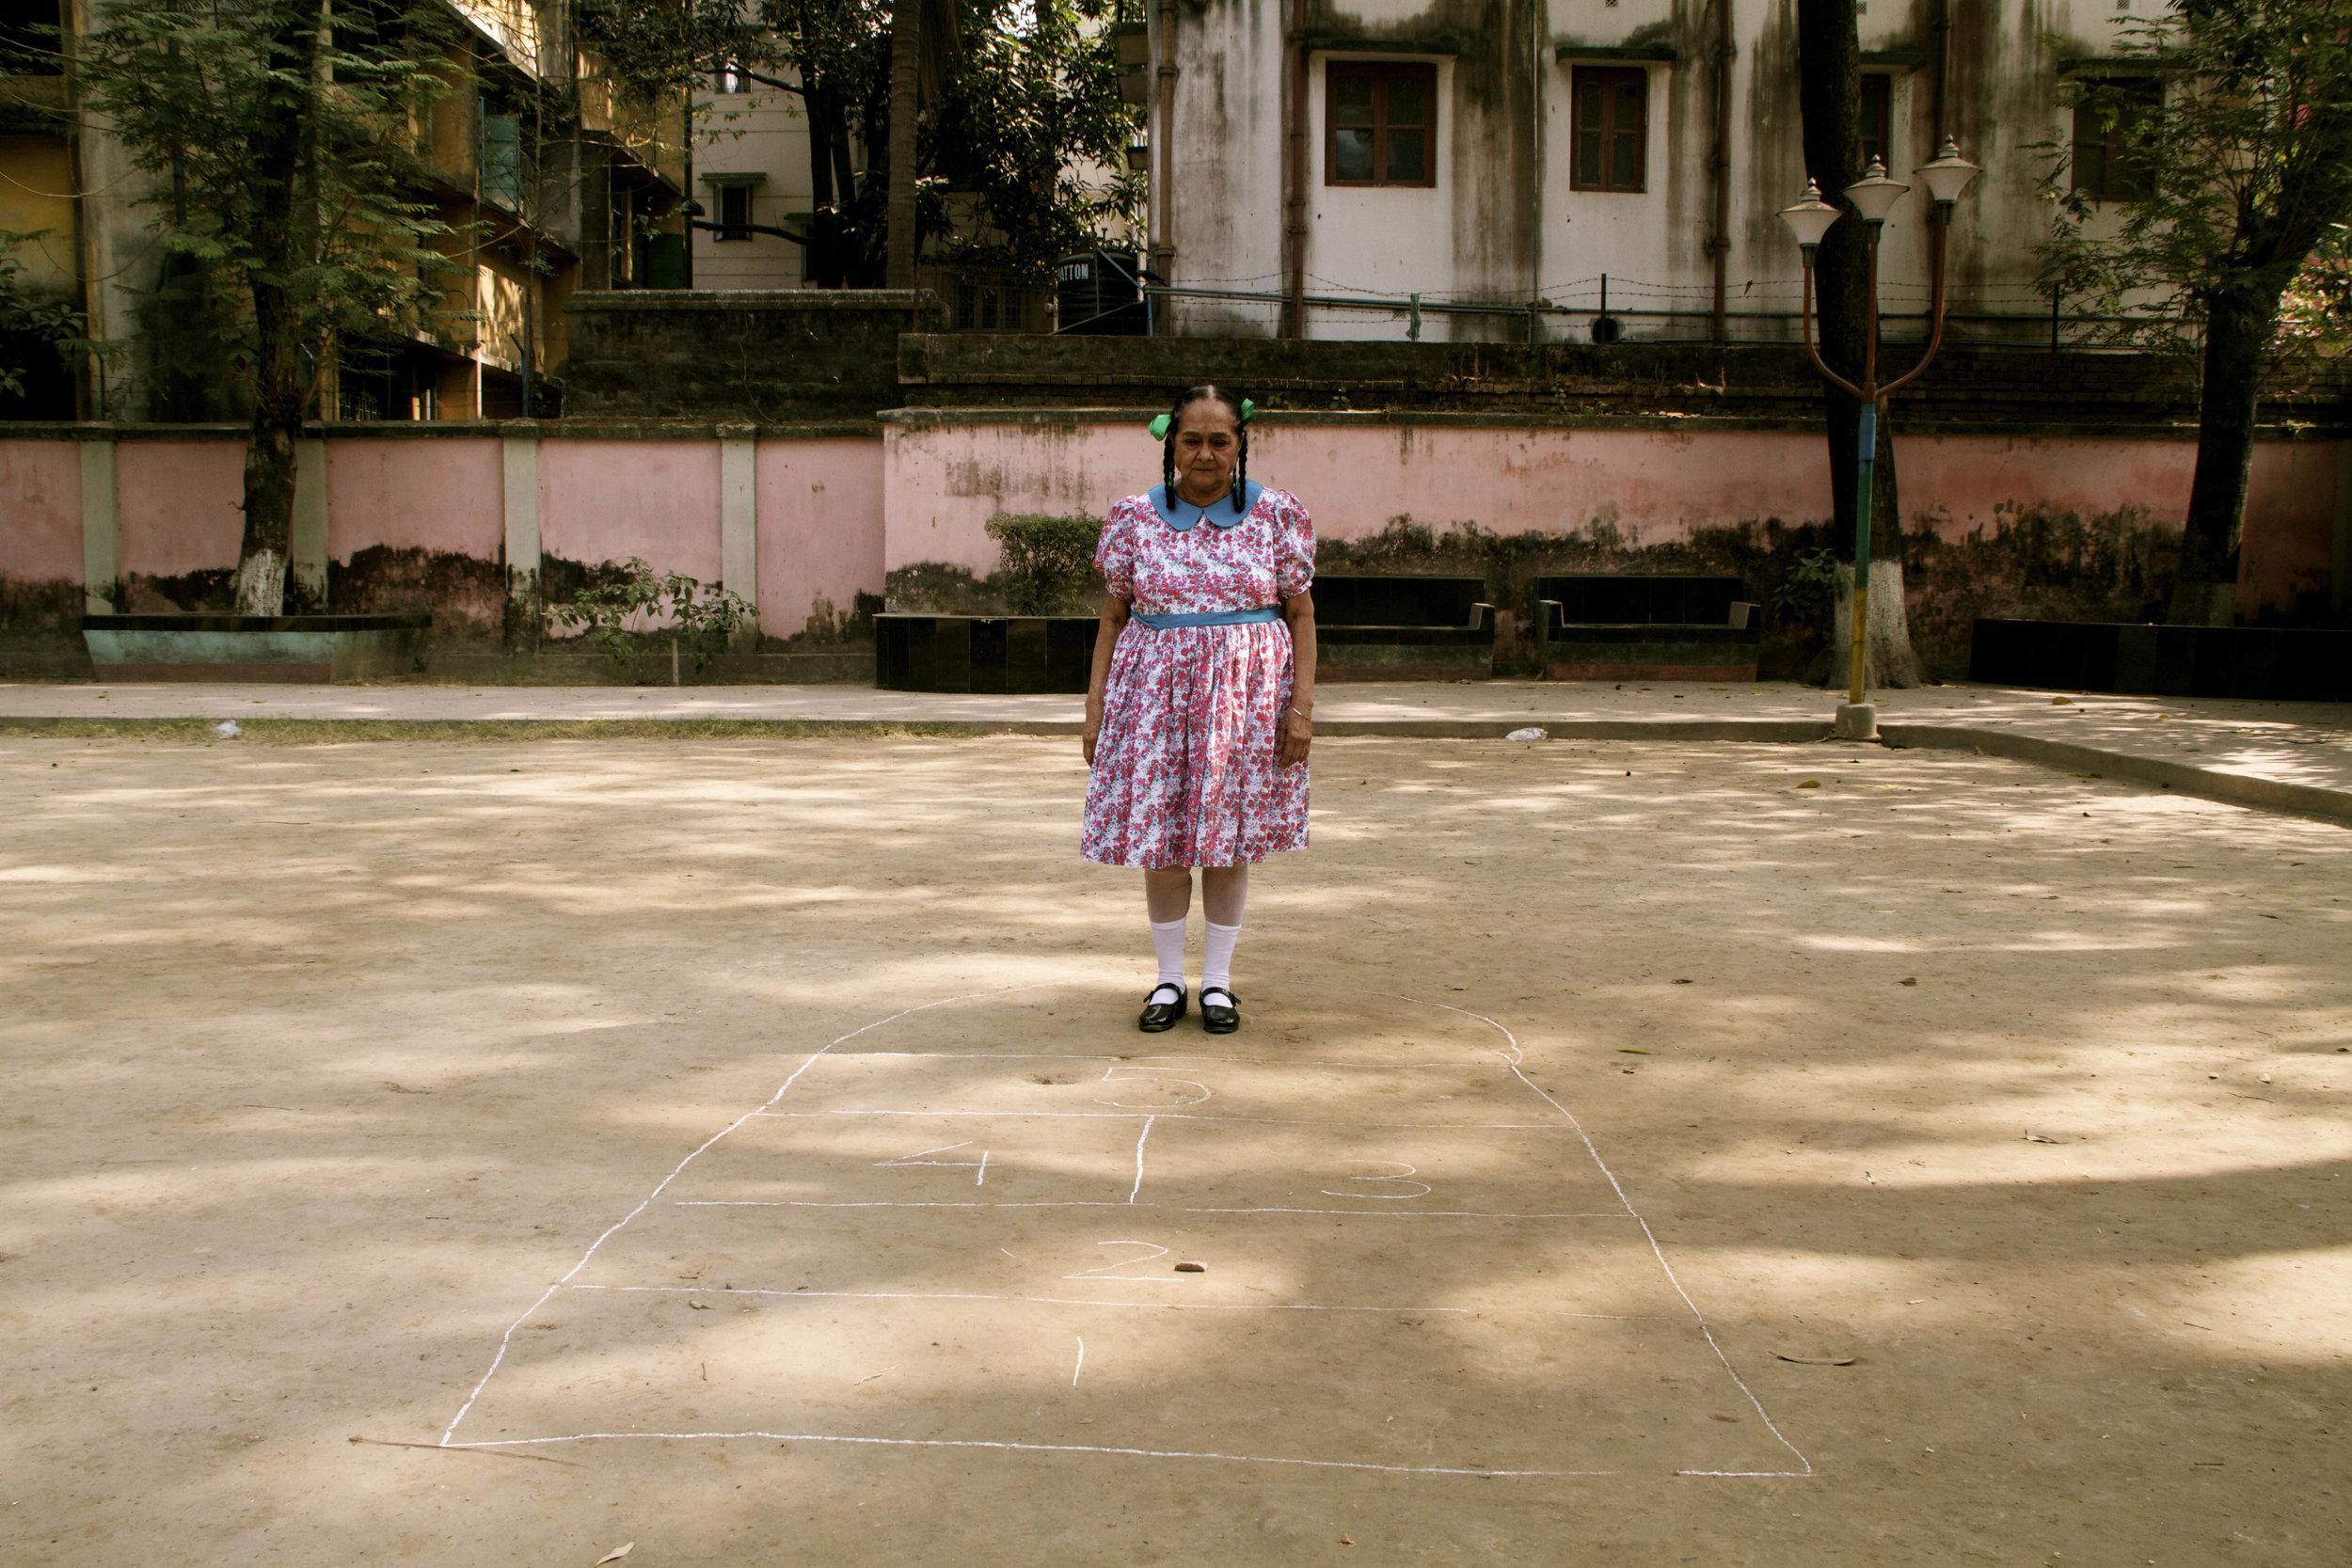 Ma Inna in Mogok , Indri was known as Ma Inna, as a little girl growing up in Mogok, Burma.